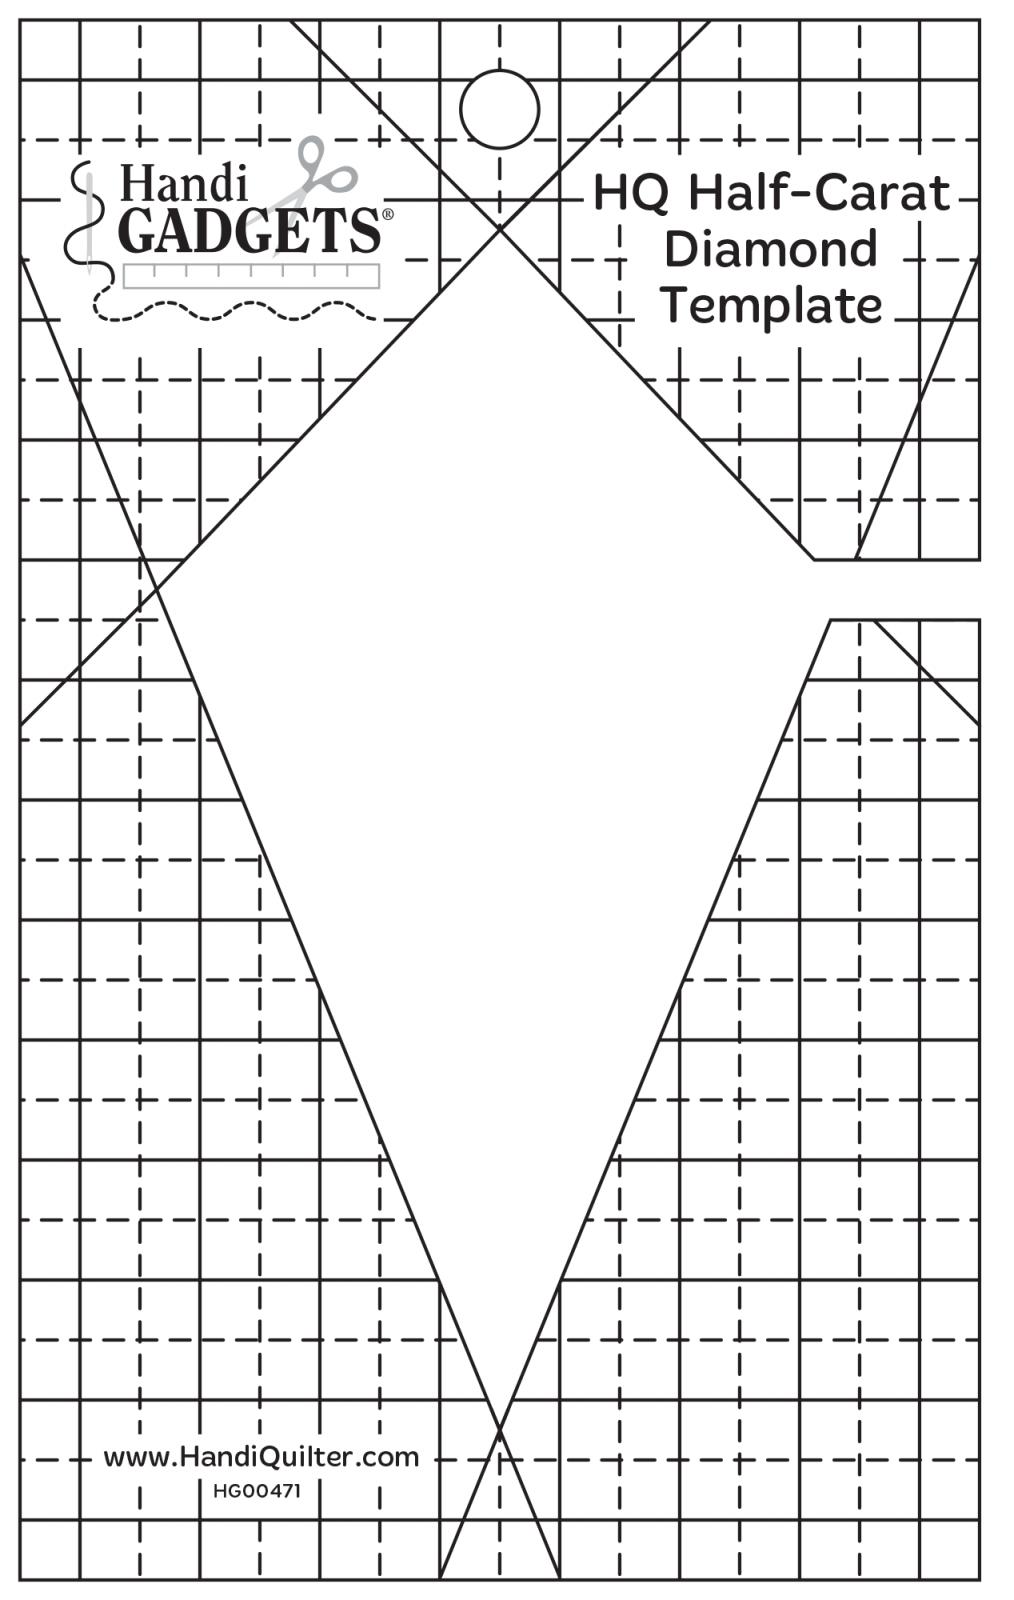 HQ Half Carat Diamond template